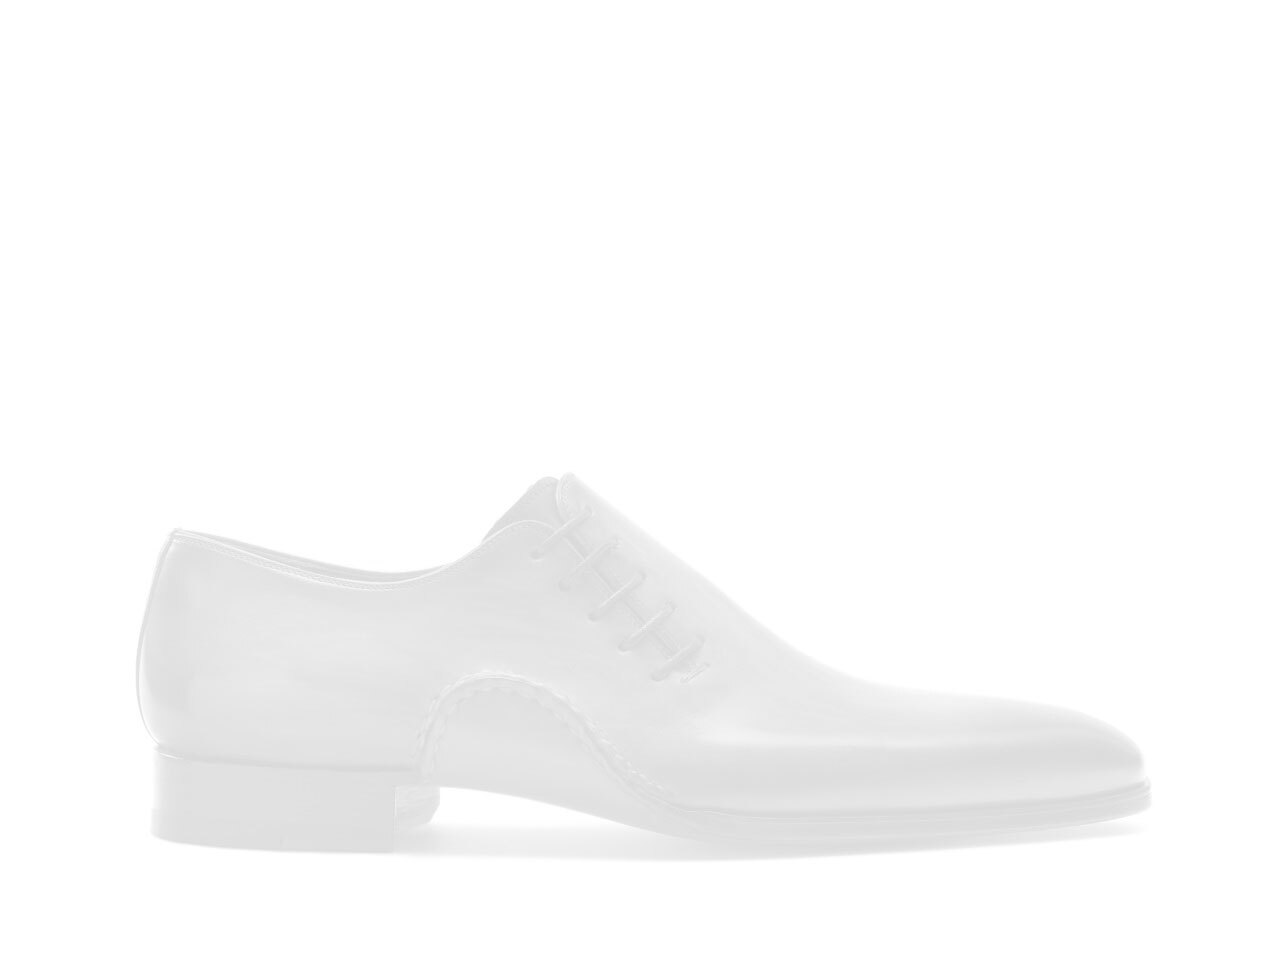 Pair of the Magnanni Raro Black Men's Slip On Loafers